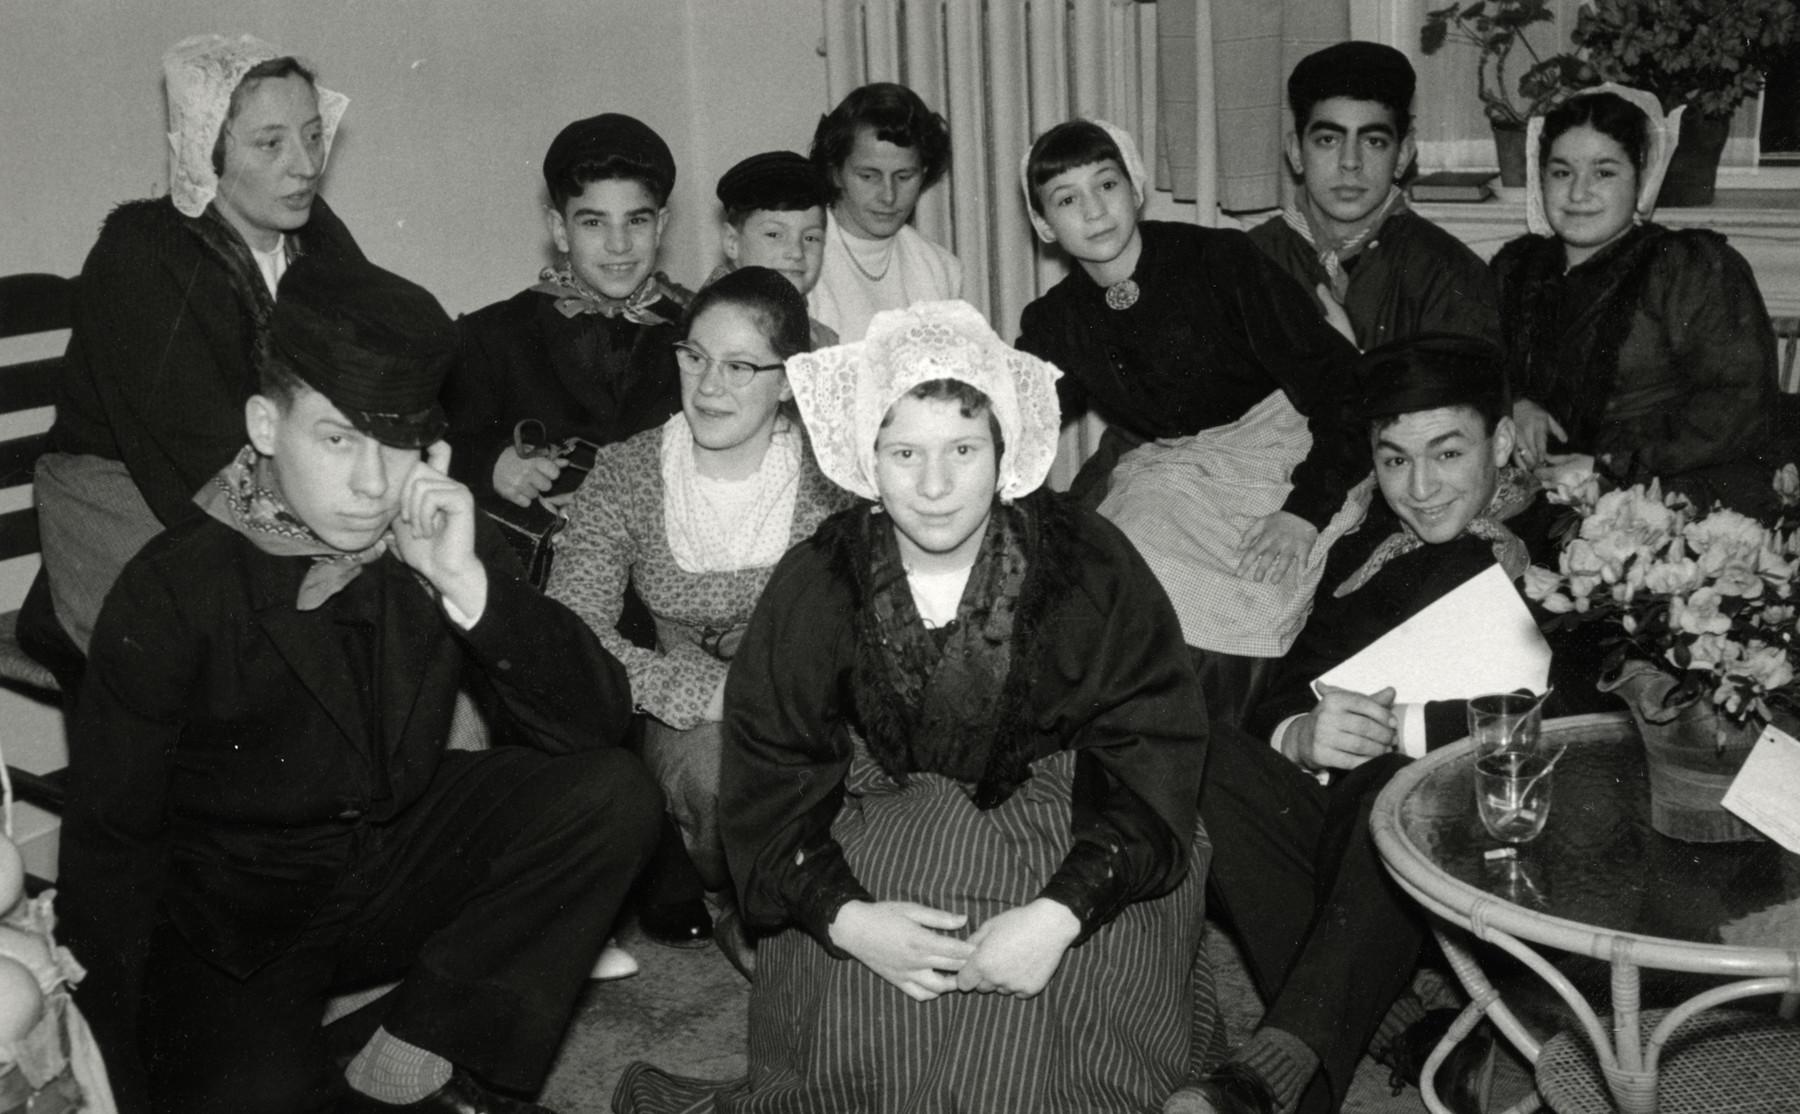 Group portrait of children wearing their Purim costumes in the Bergstichtung postwar children's home run by Ezrat Hayeled.